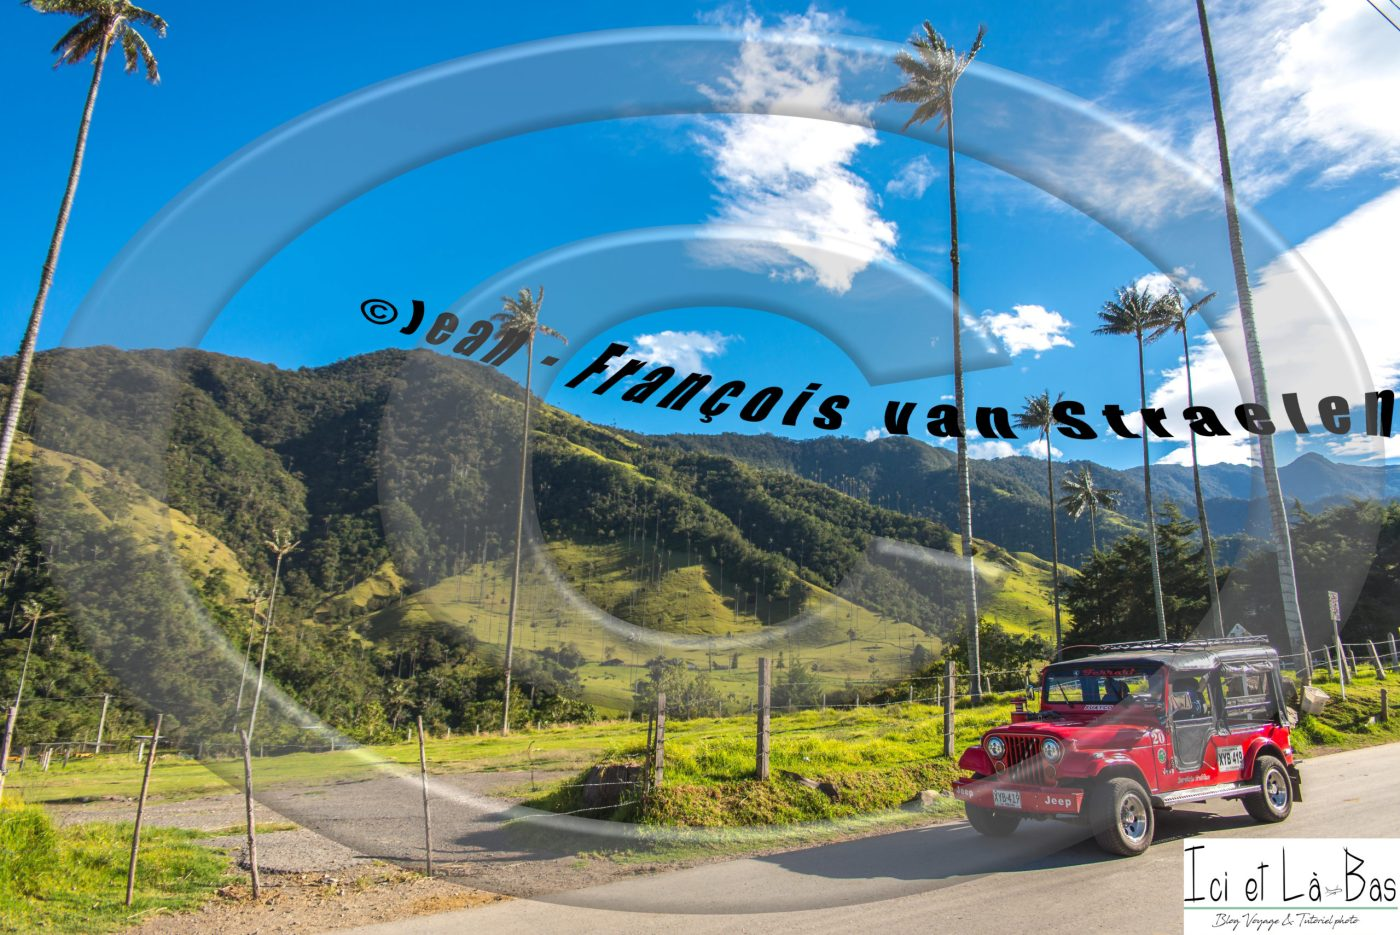 signer vos Photos tutoriel photo blog voyage